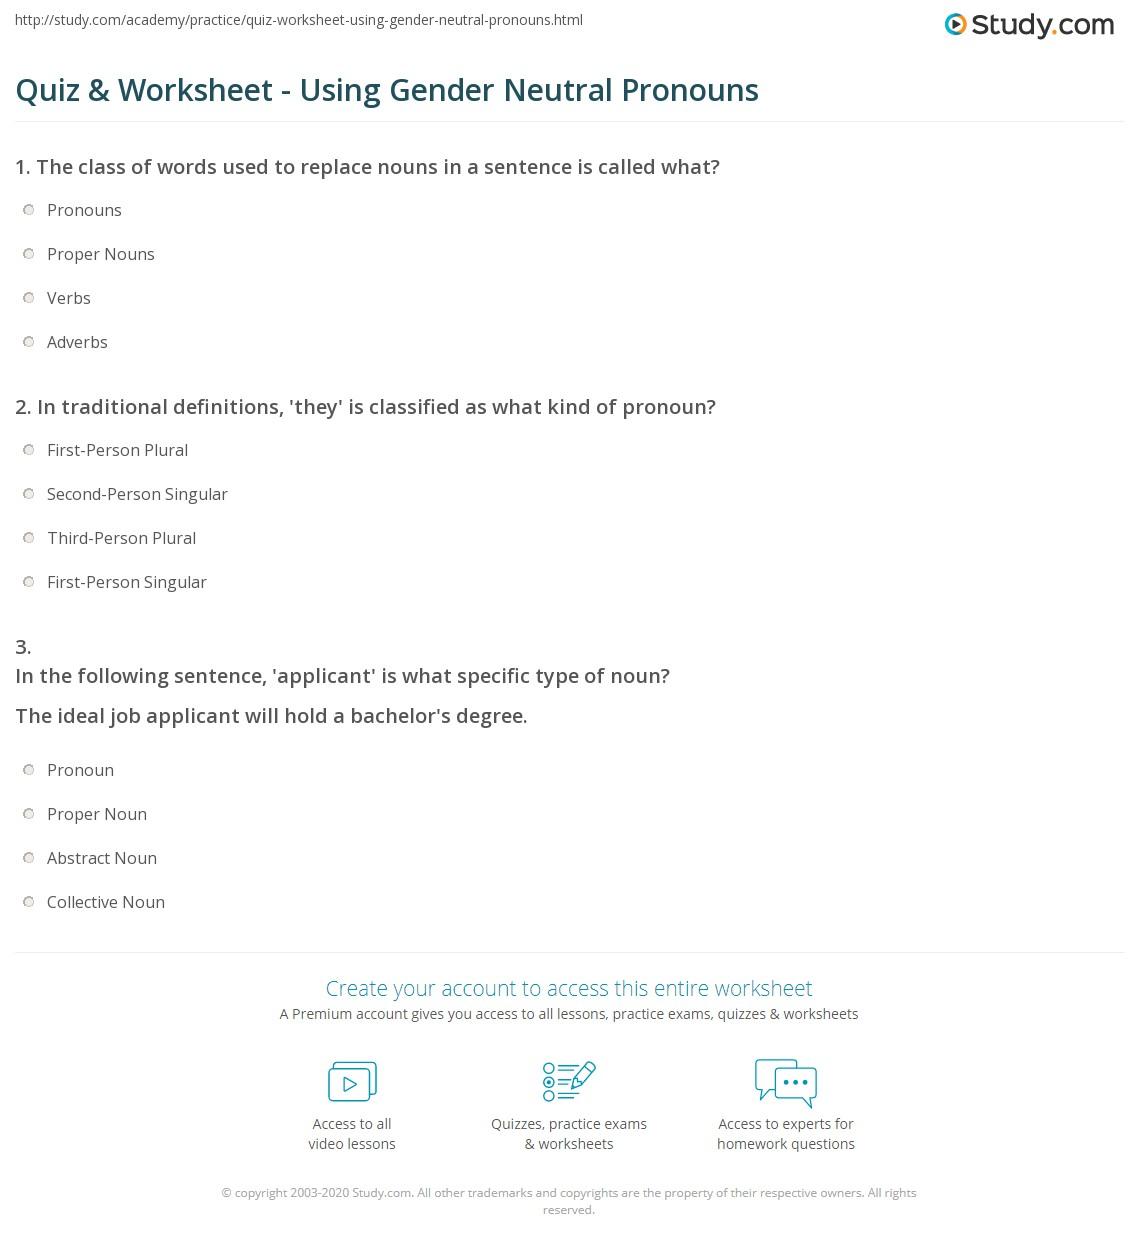 Quiz Worksheet Using Gender Neutral Pronouns – Noun and Pronoun Worksheets